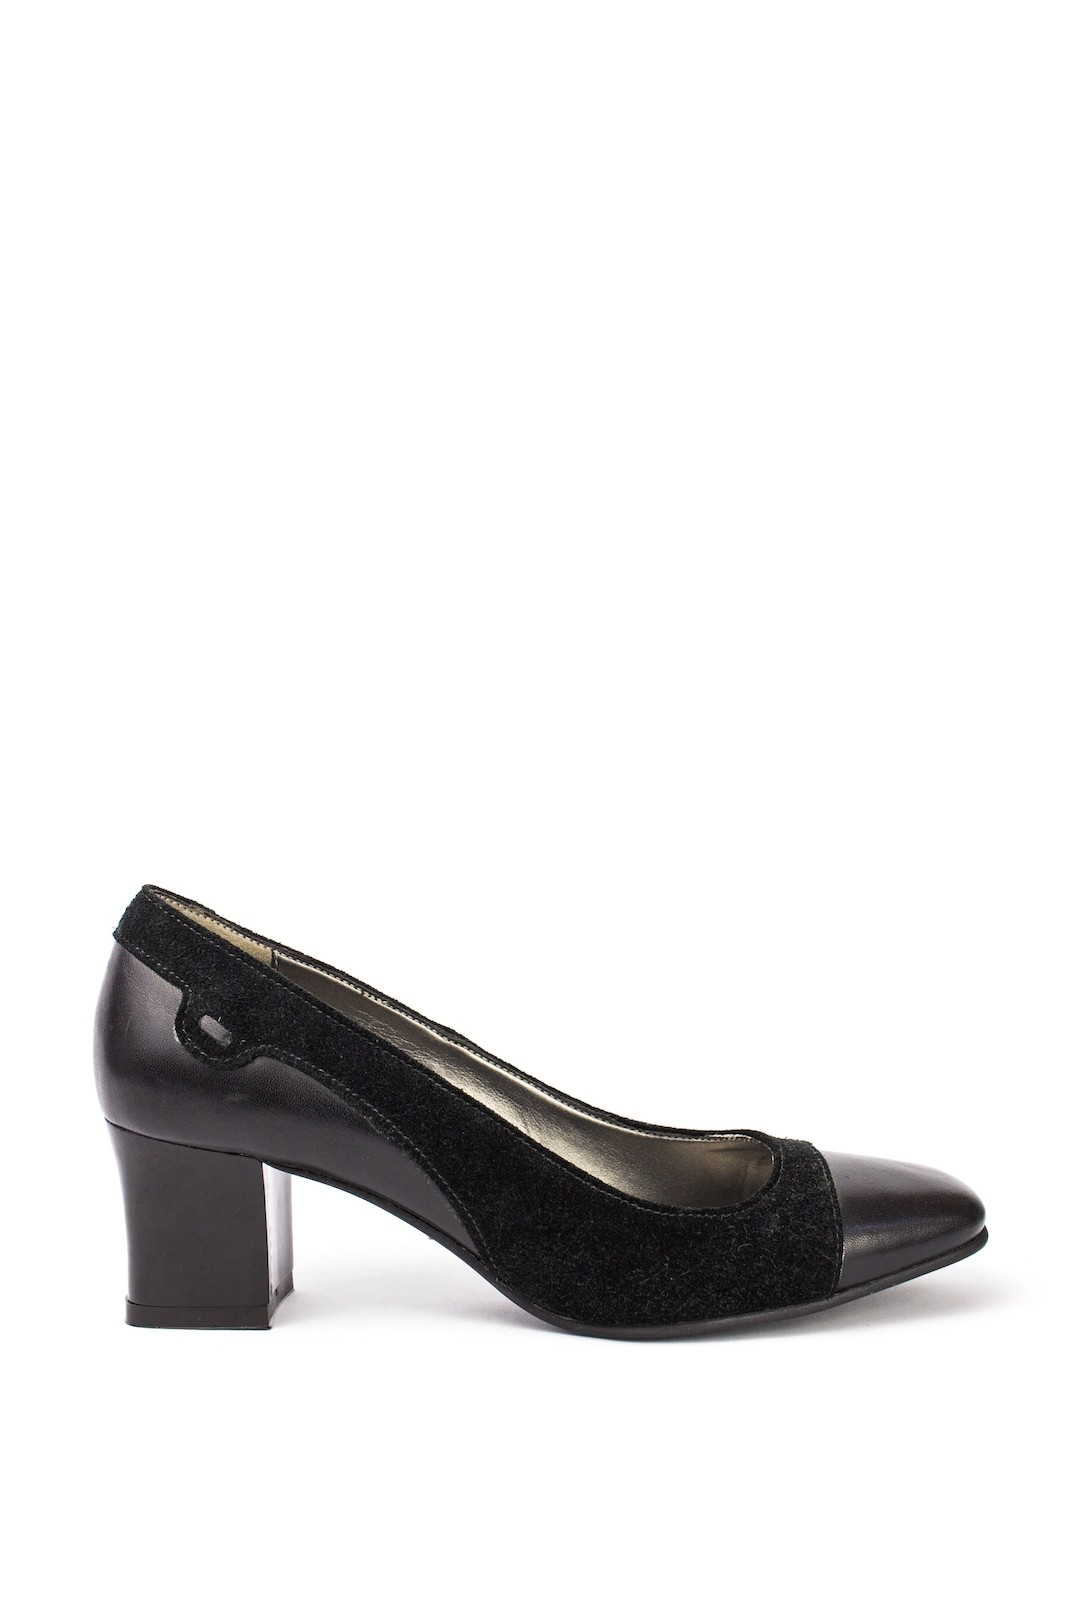 Pantofi Dama piele naturala negru Anita